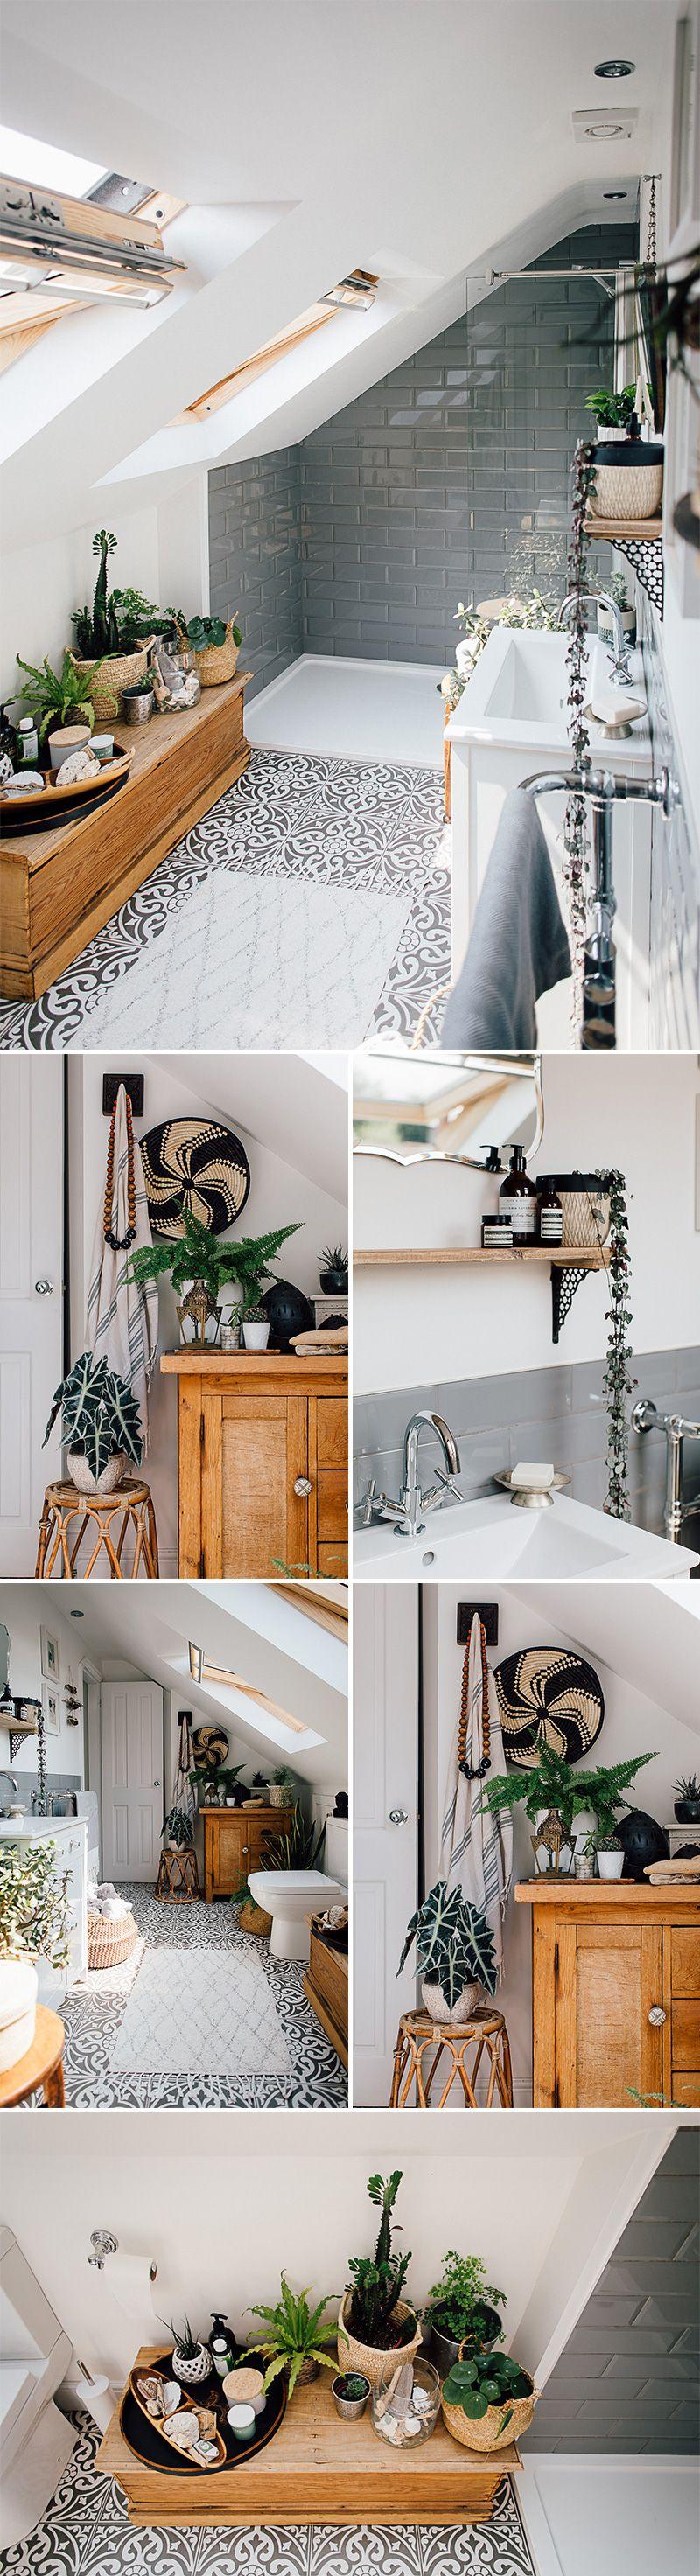 Global Inspired Home Tour Upstairs Home Decor Styles Loft Bathroom Bathroom Inspiration